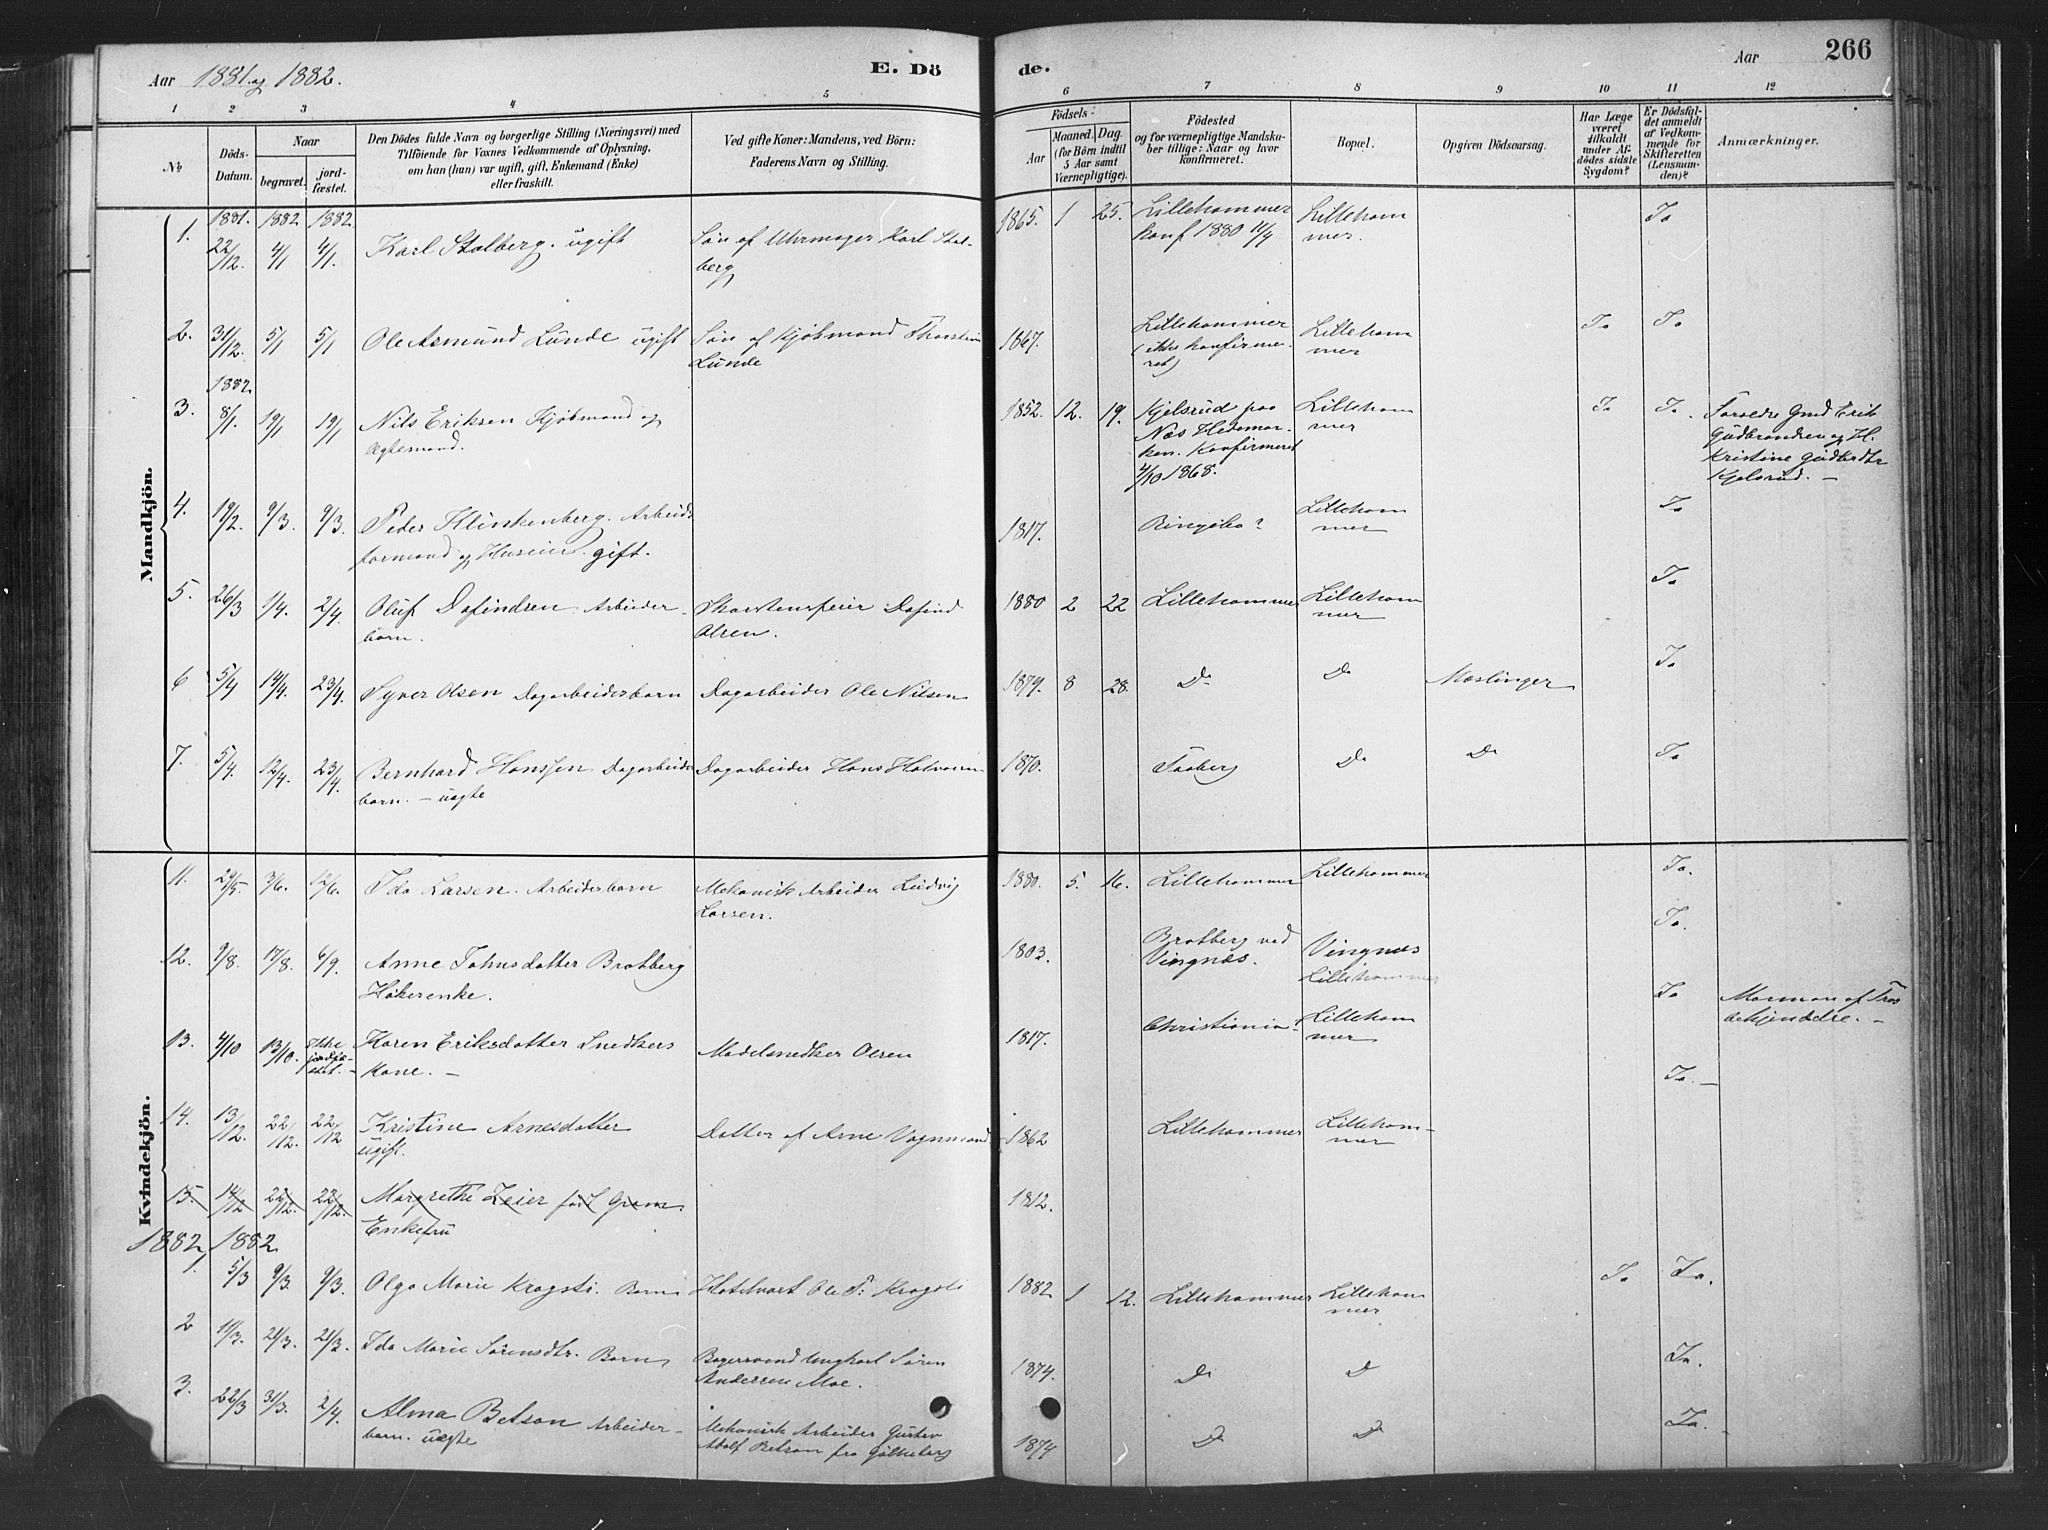 SAH, Fåberg prestekontor, Ministerialbok nr. 10, 1879-1900, s. 266